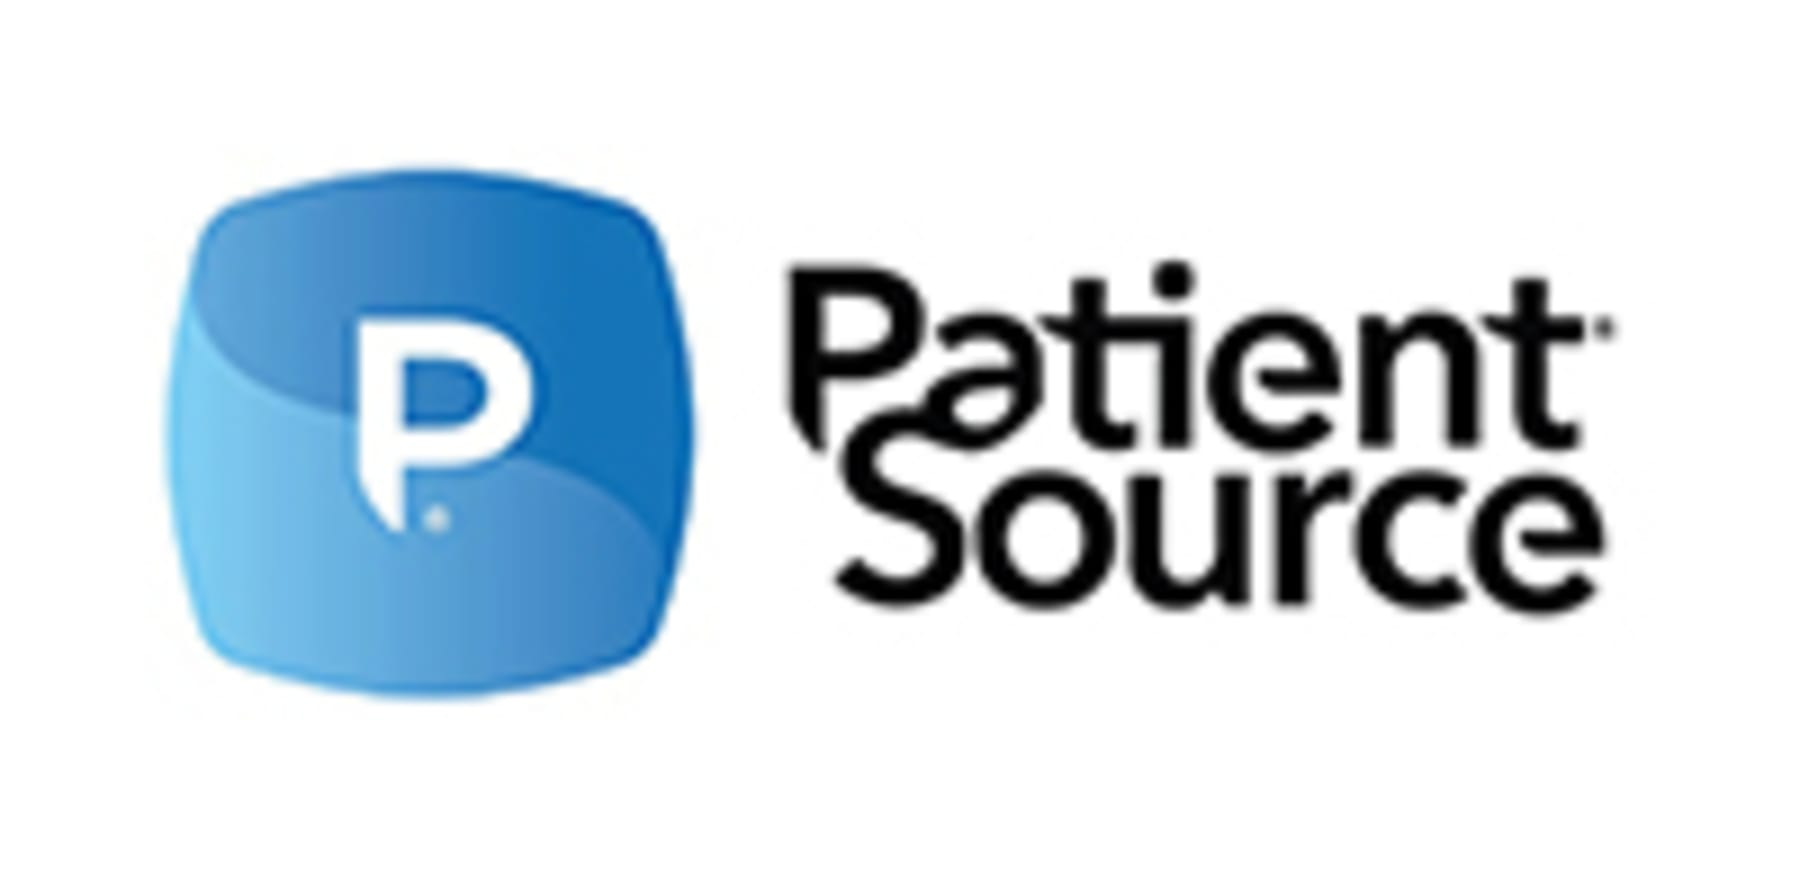 PatientSource